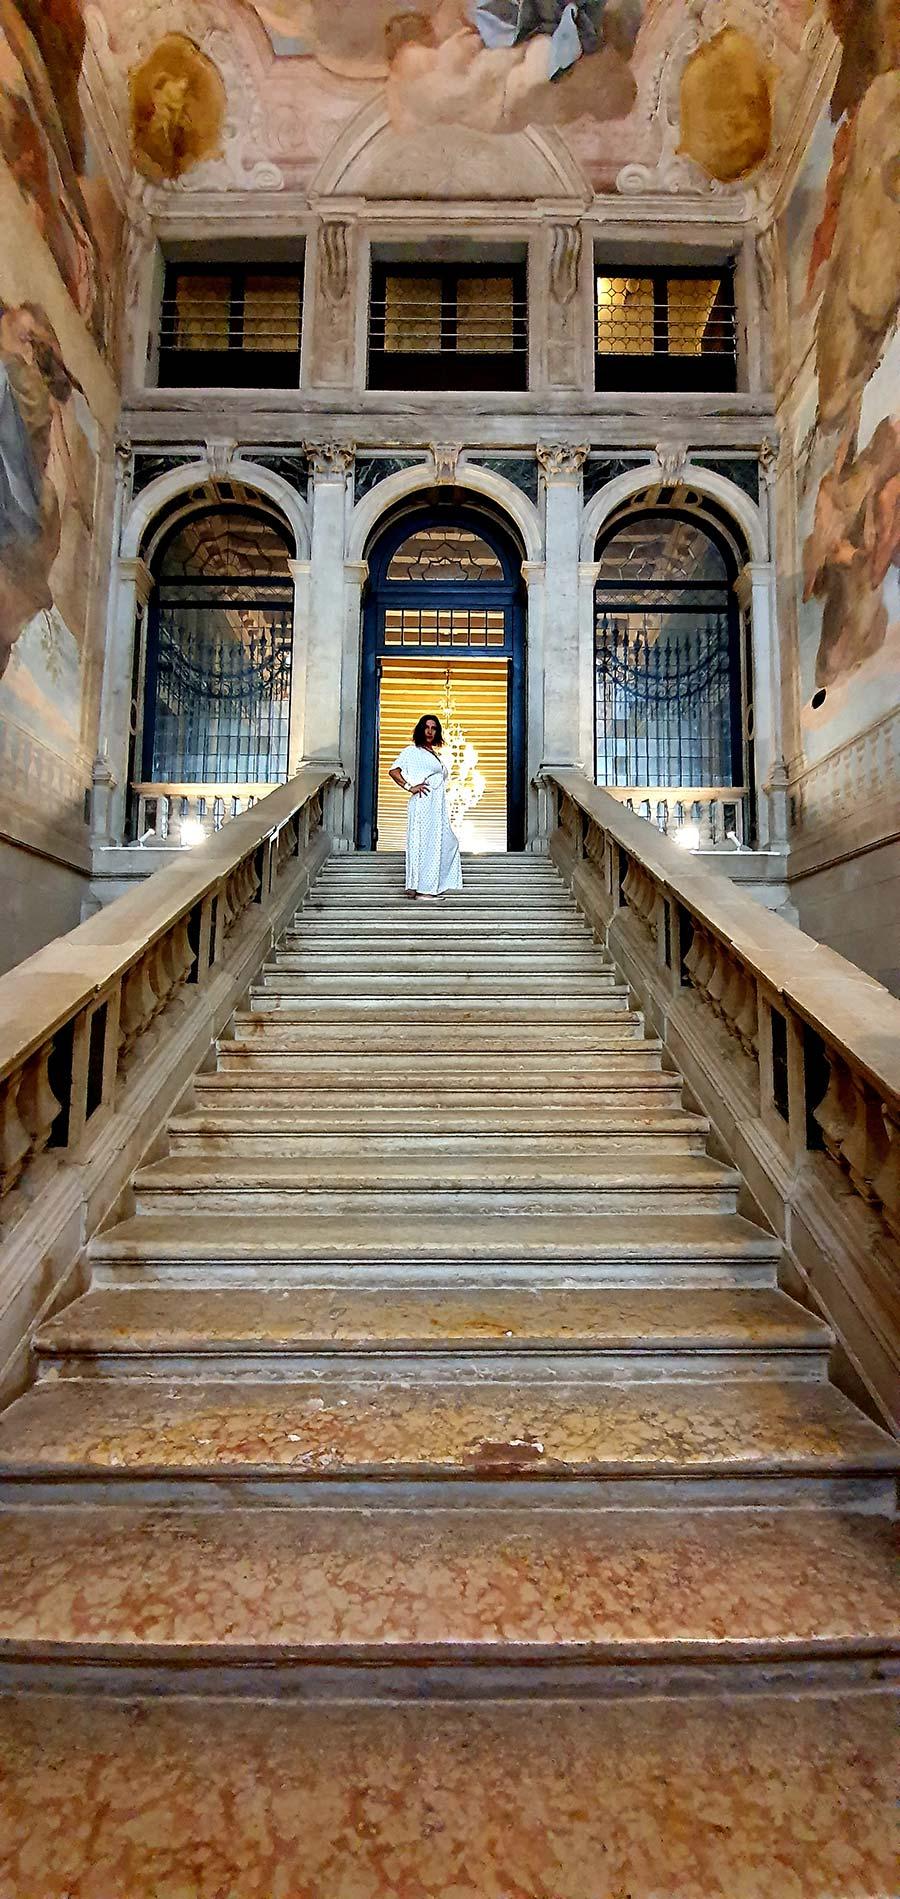 Ca' Sagredo Hotel staircase Venice